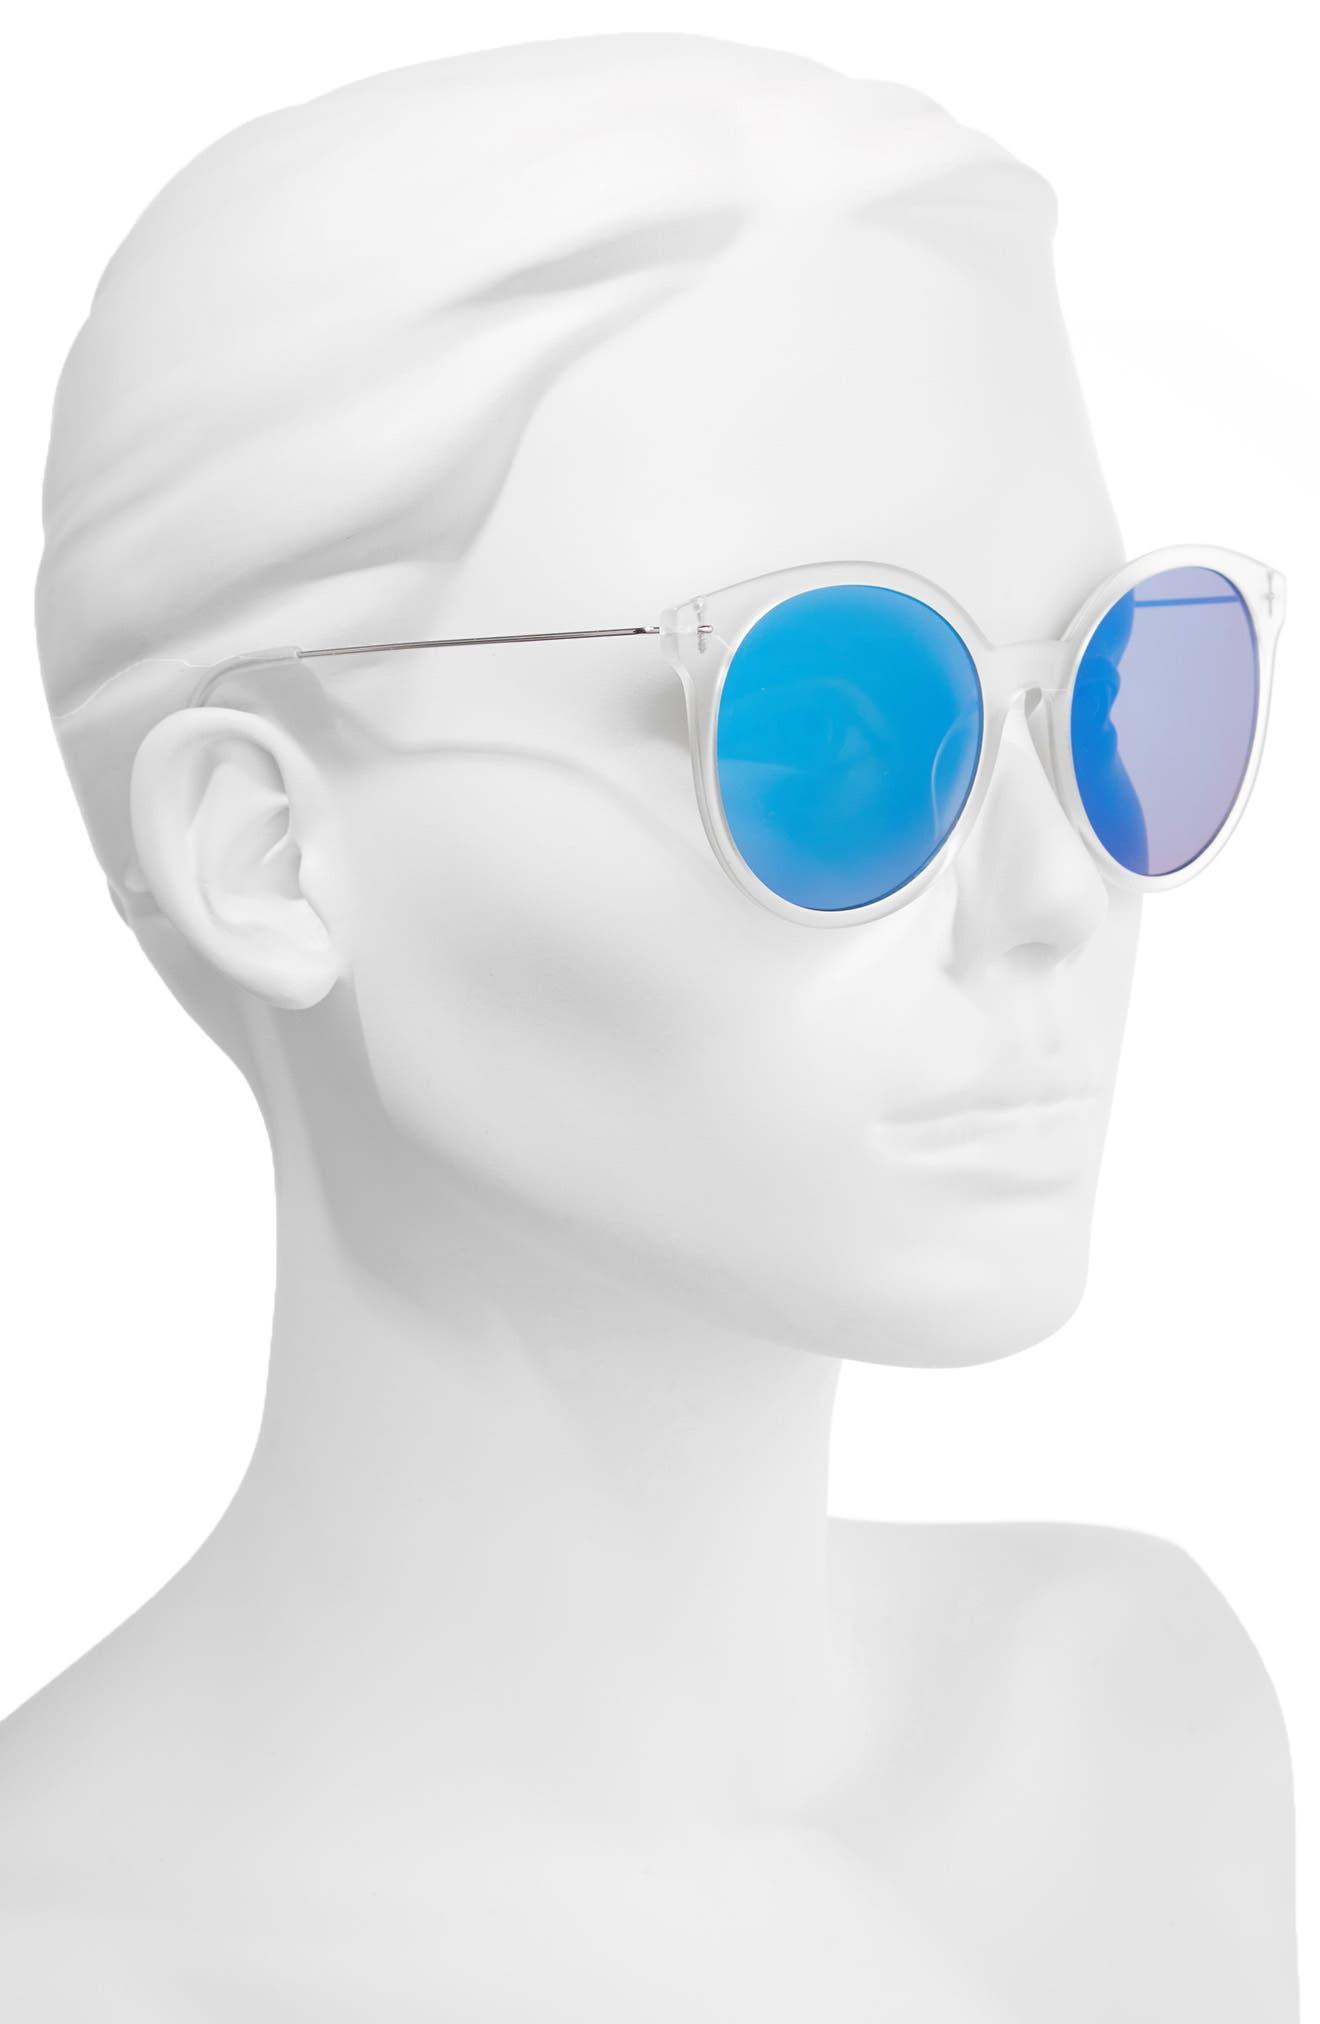 GLANCE EYEWEAR,                             62mm Transparent Round Lens Sunglasses,                             Alternate thumbnail 2, color,                             100